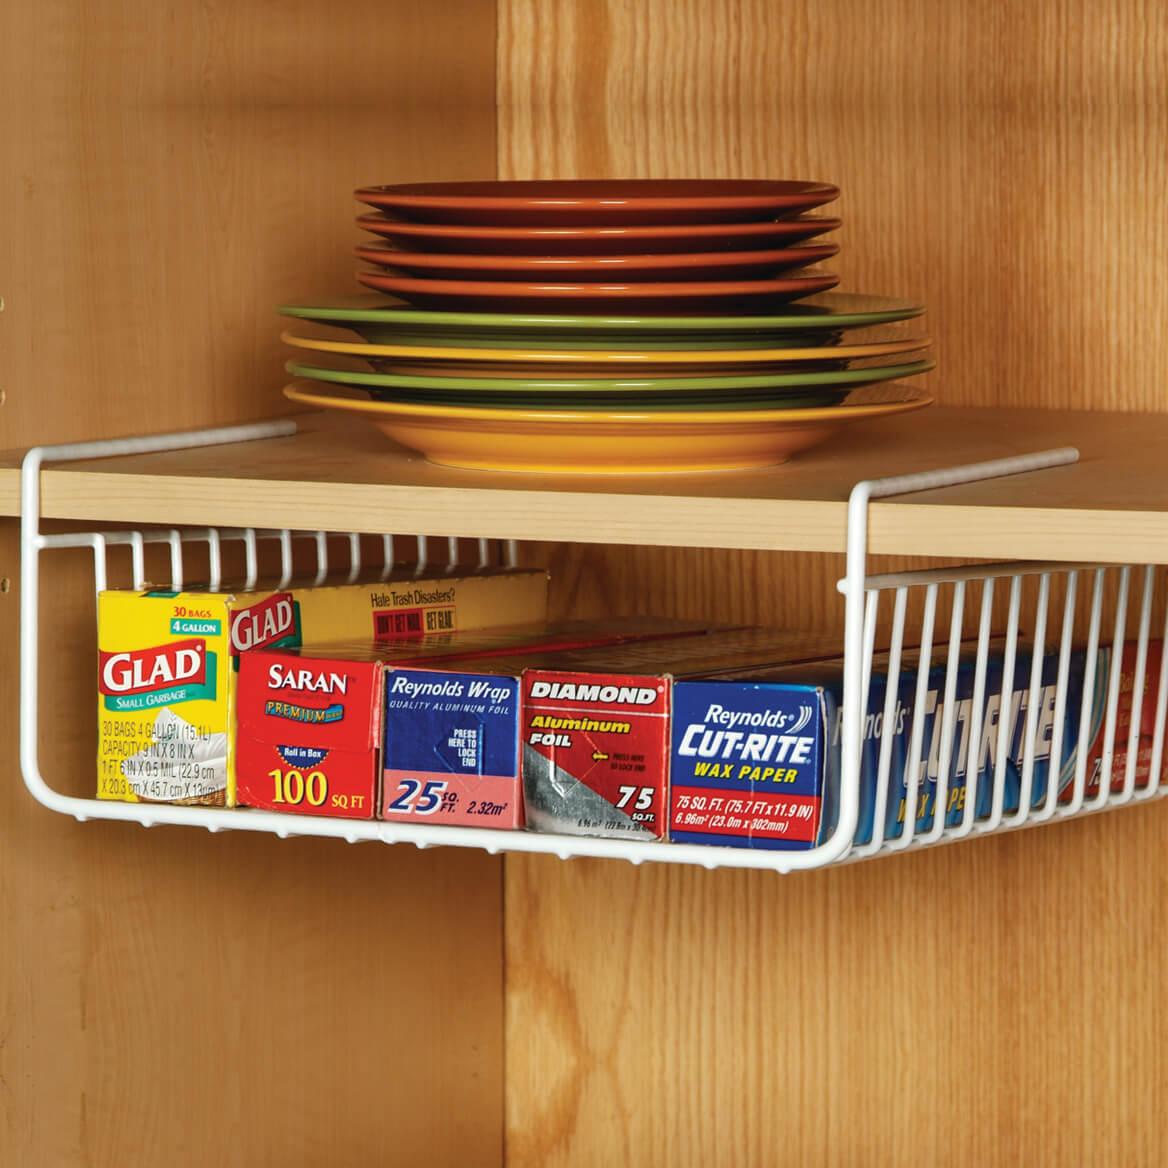 Kitchen wrap holder plastic wrap storage walter drake for Under shelf basket wrap rack